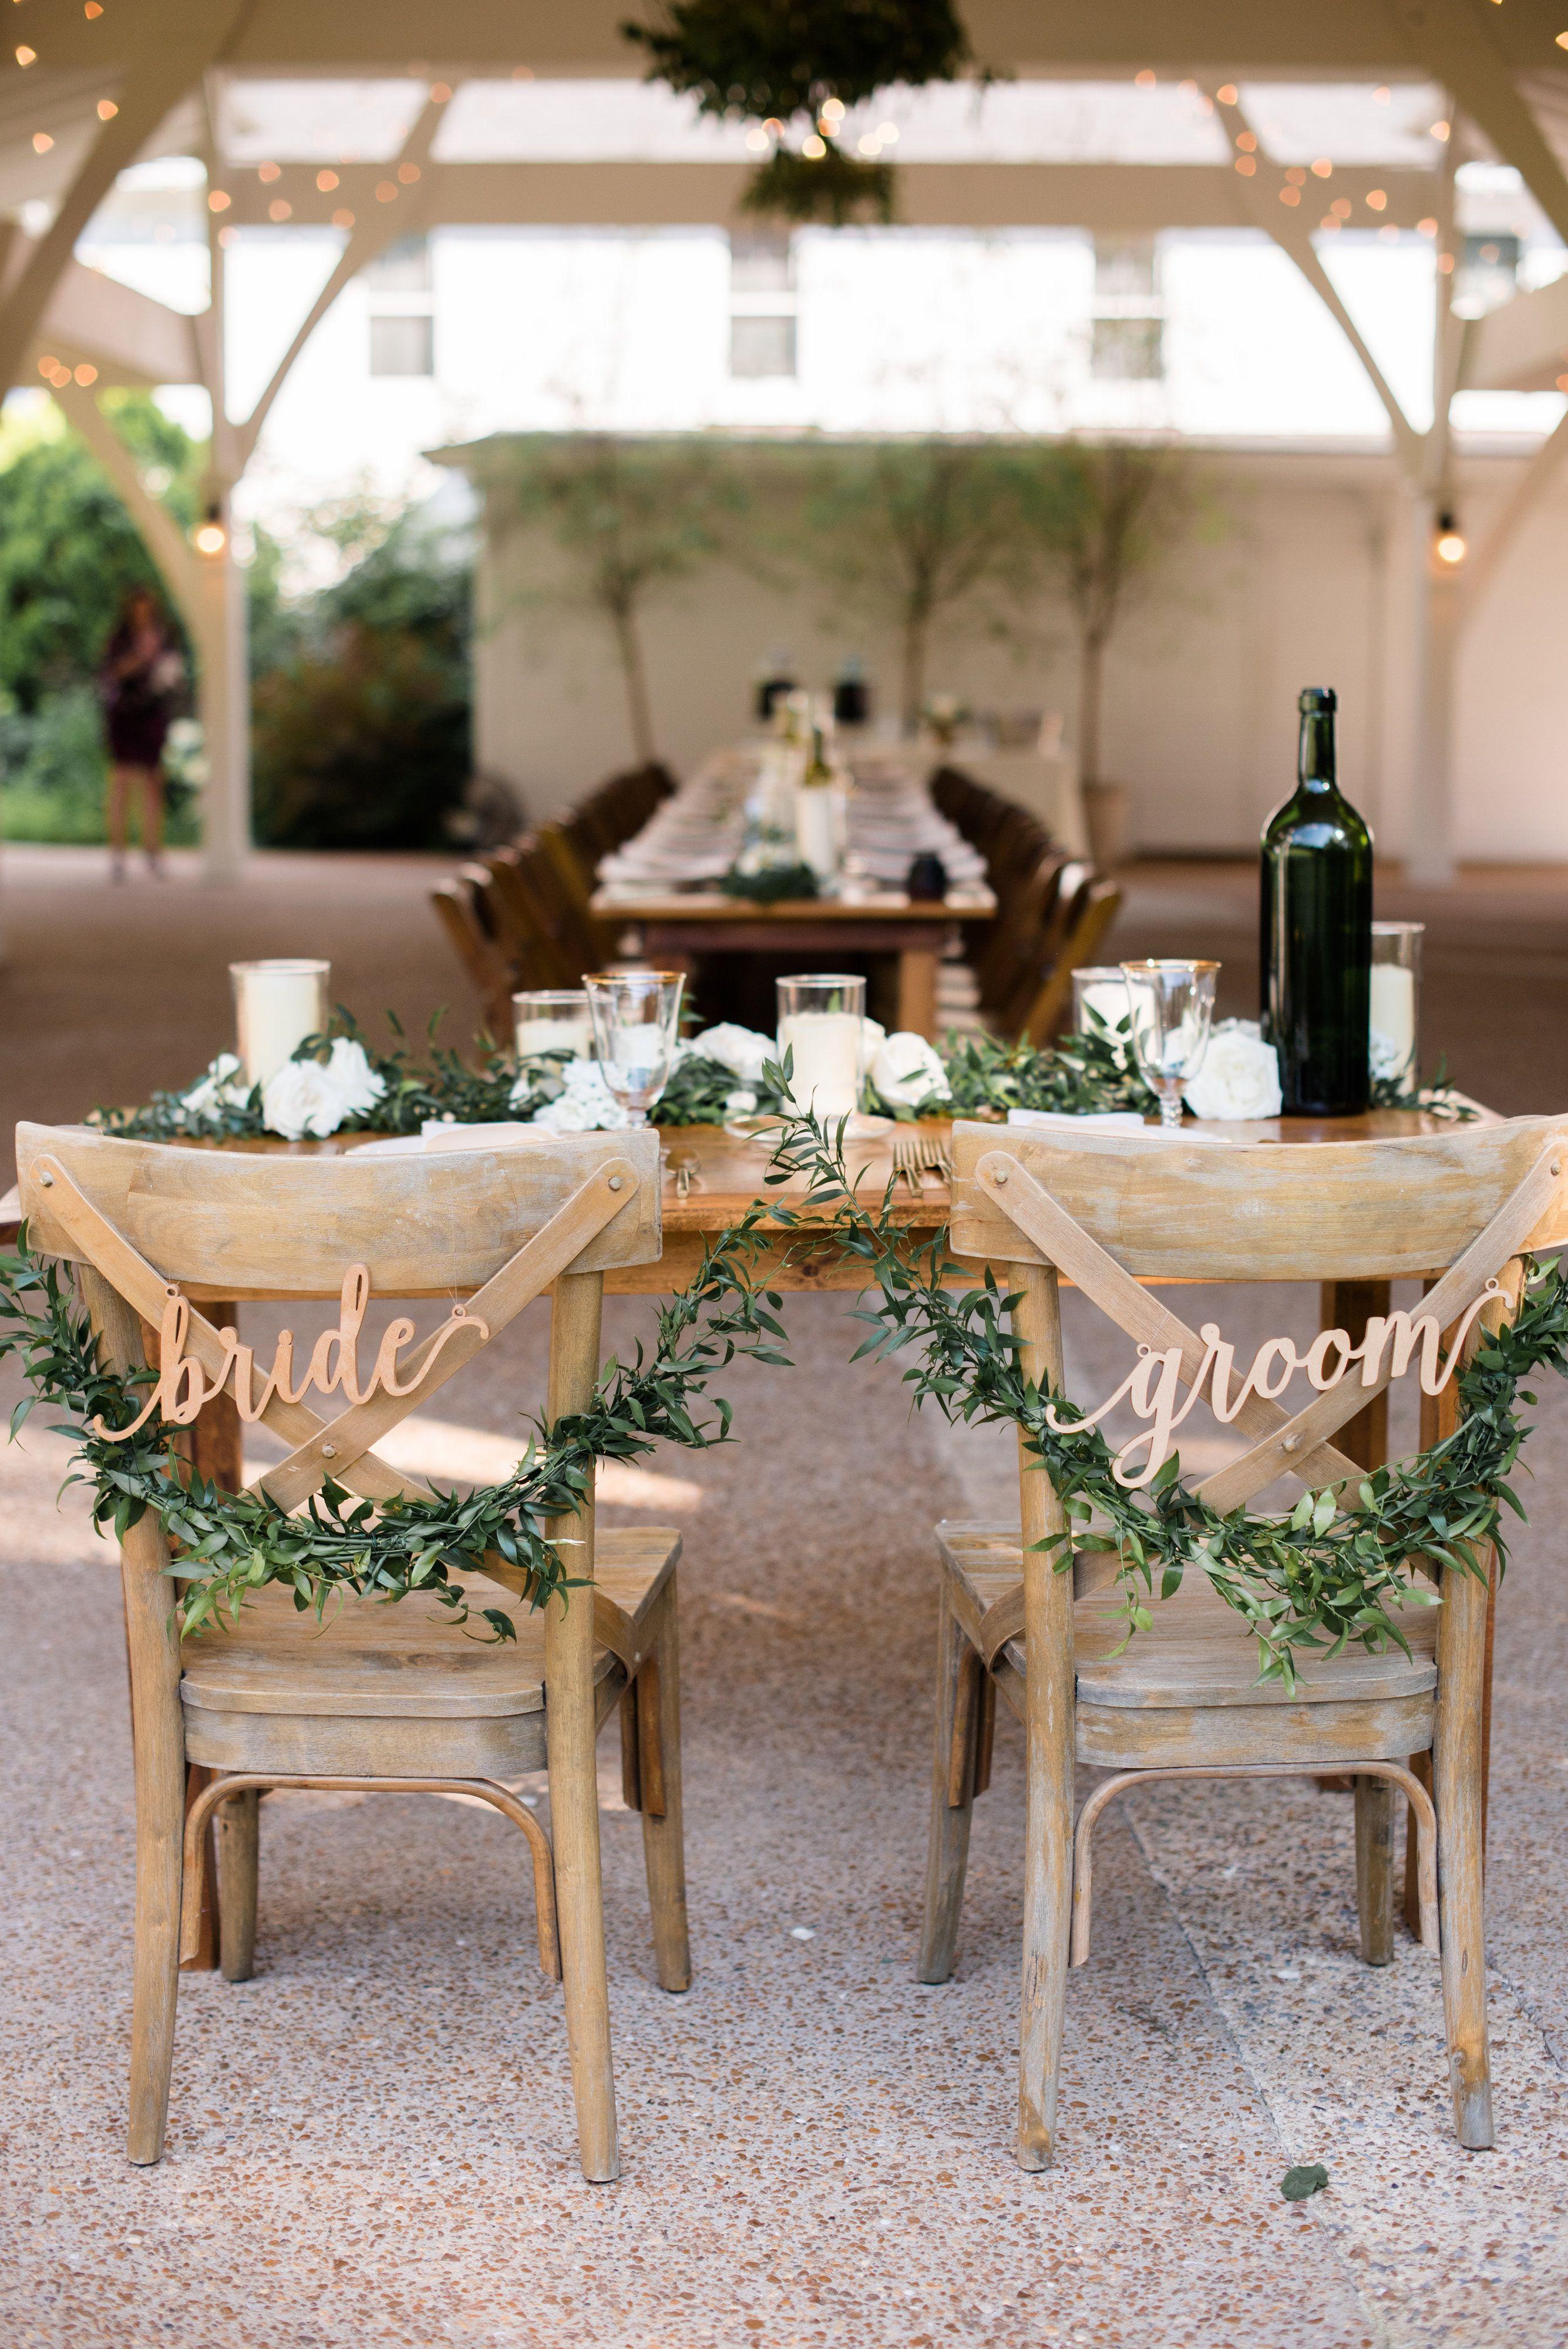 6.6.6 :: Lauren + Martin  Wedding chair decorations, Head